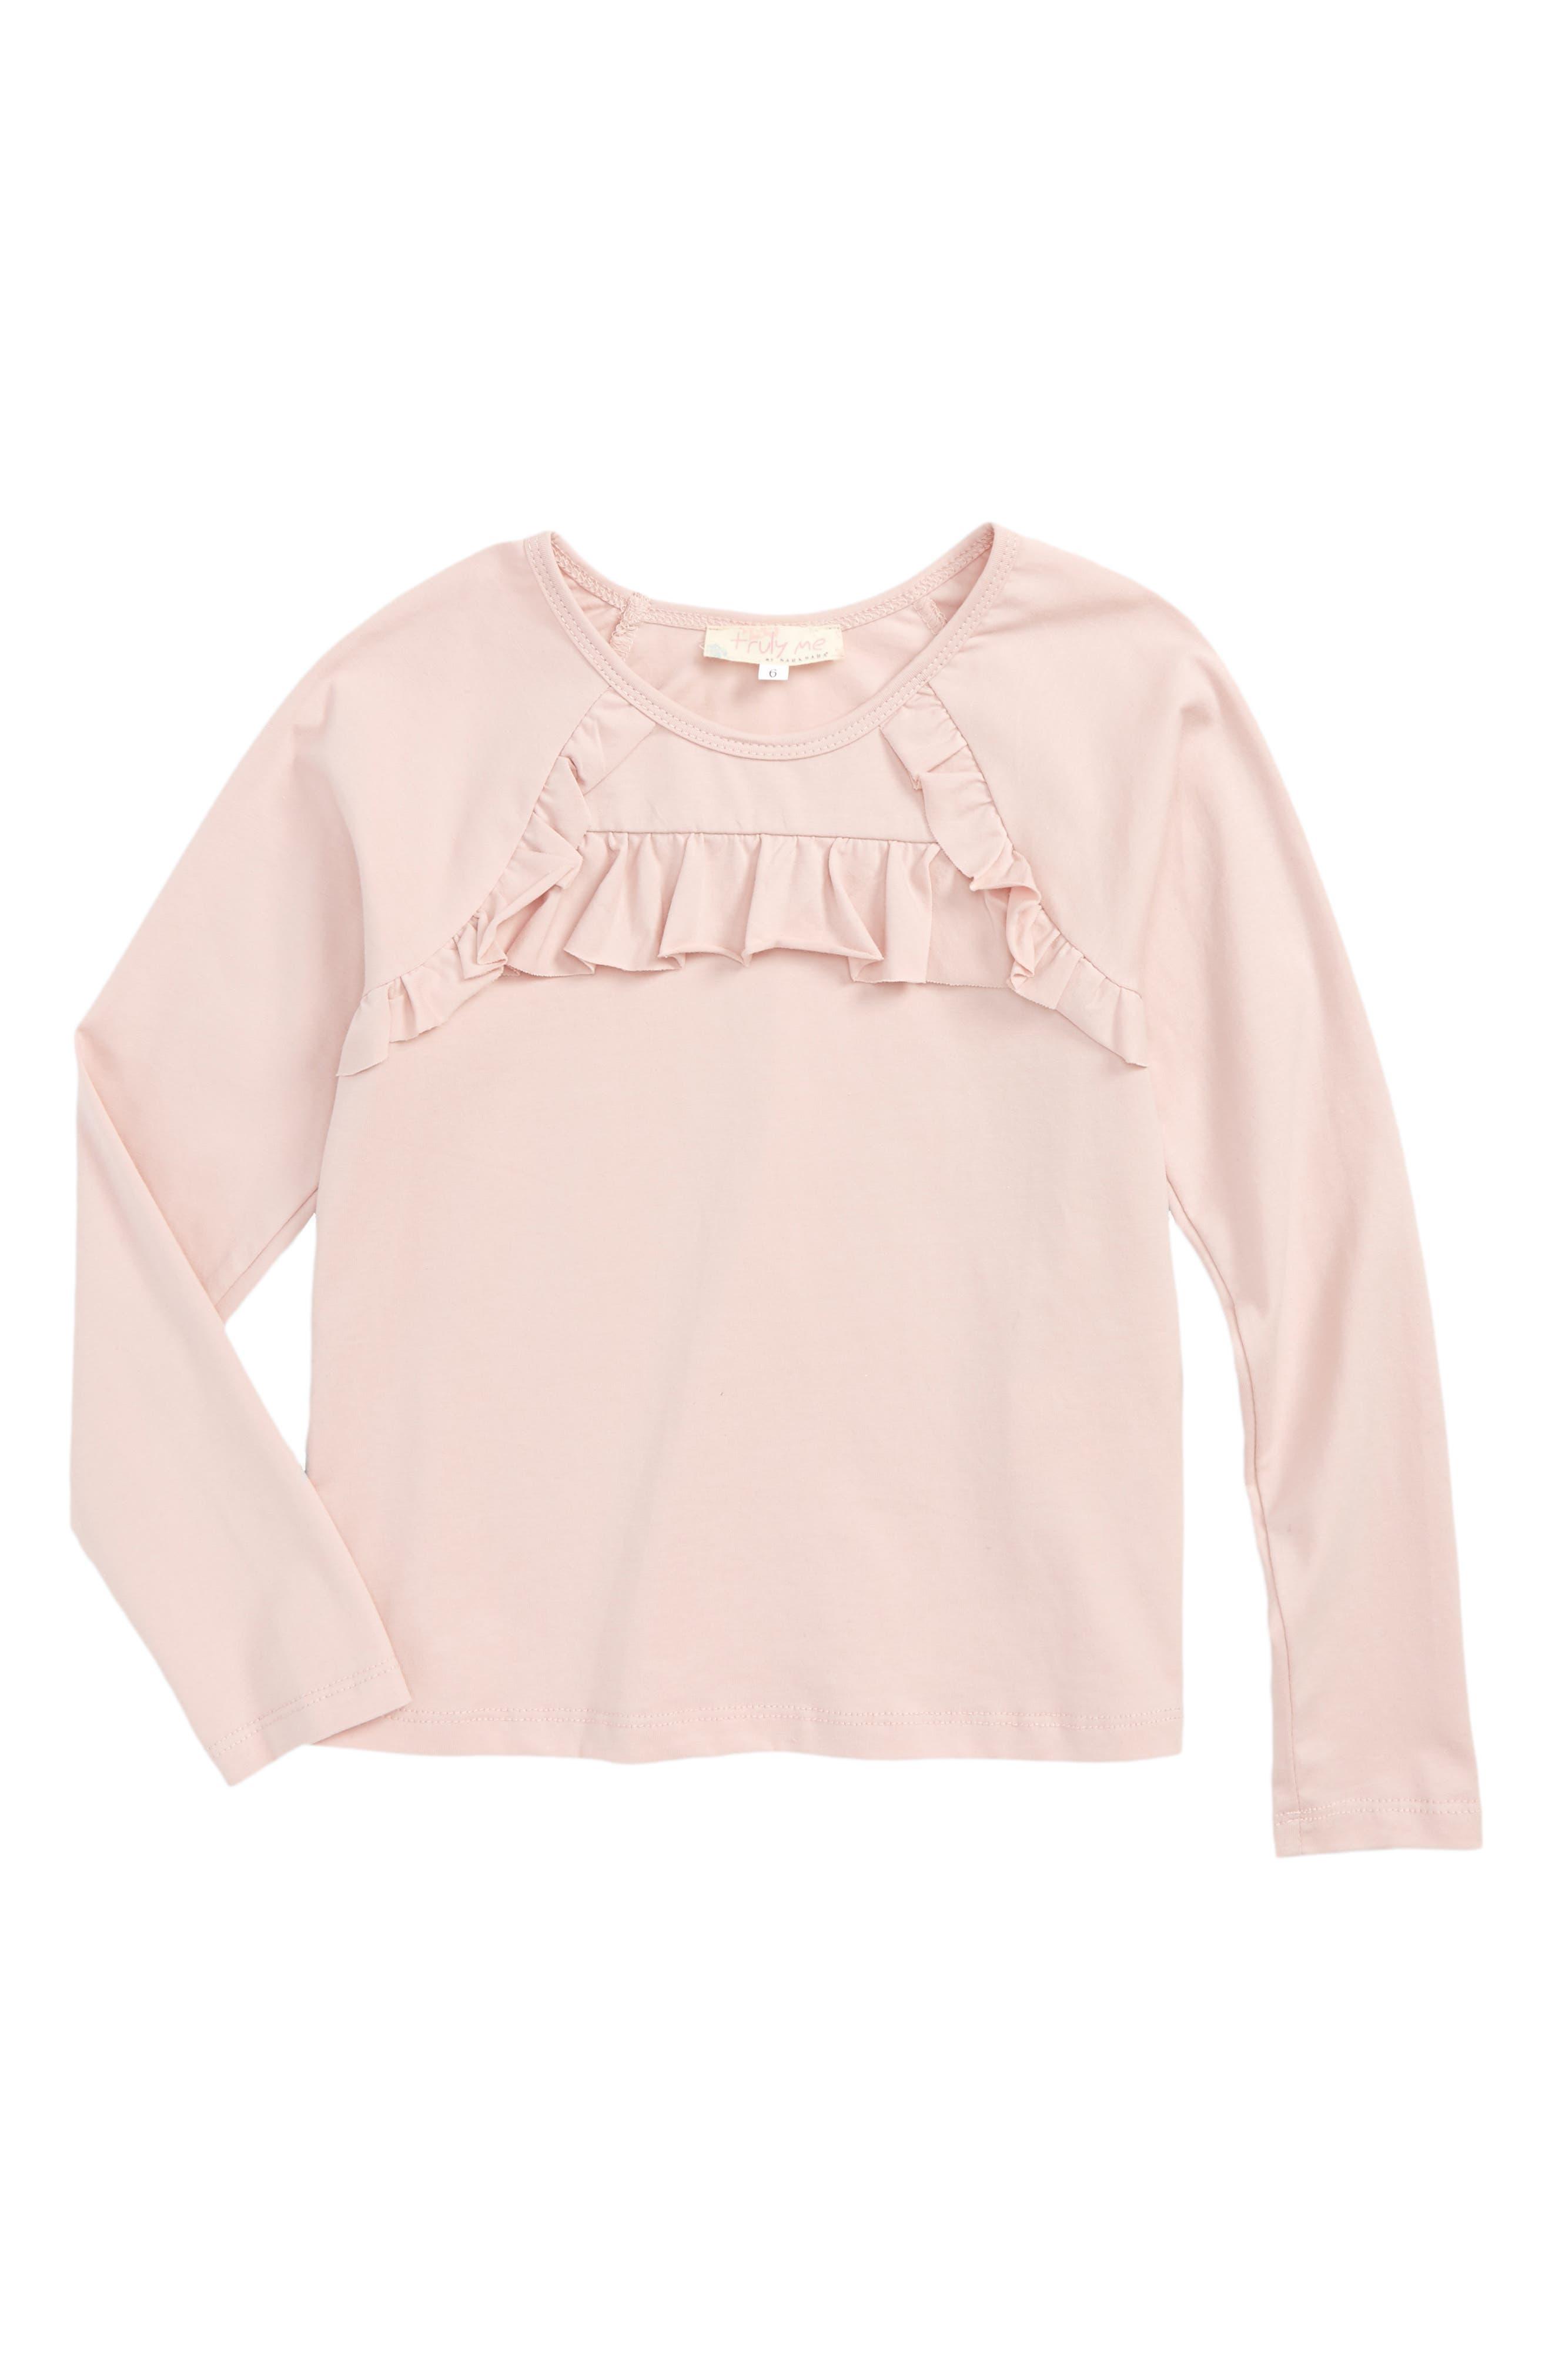 Main Image - Truly Me Ruffle Trim Tee (Toddler Girls & Little Girls)